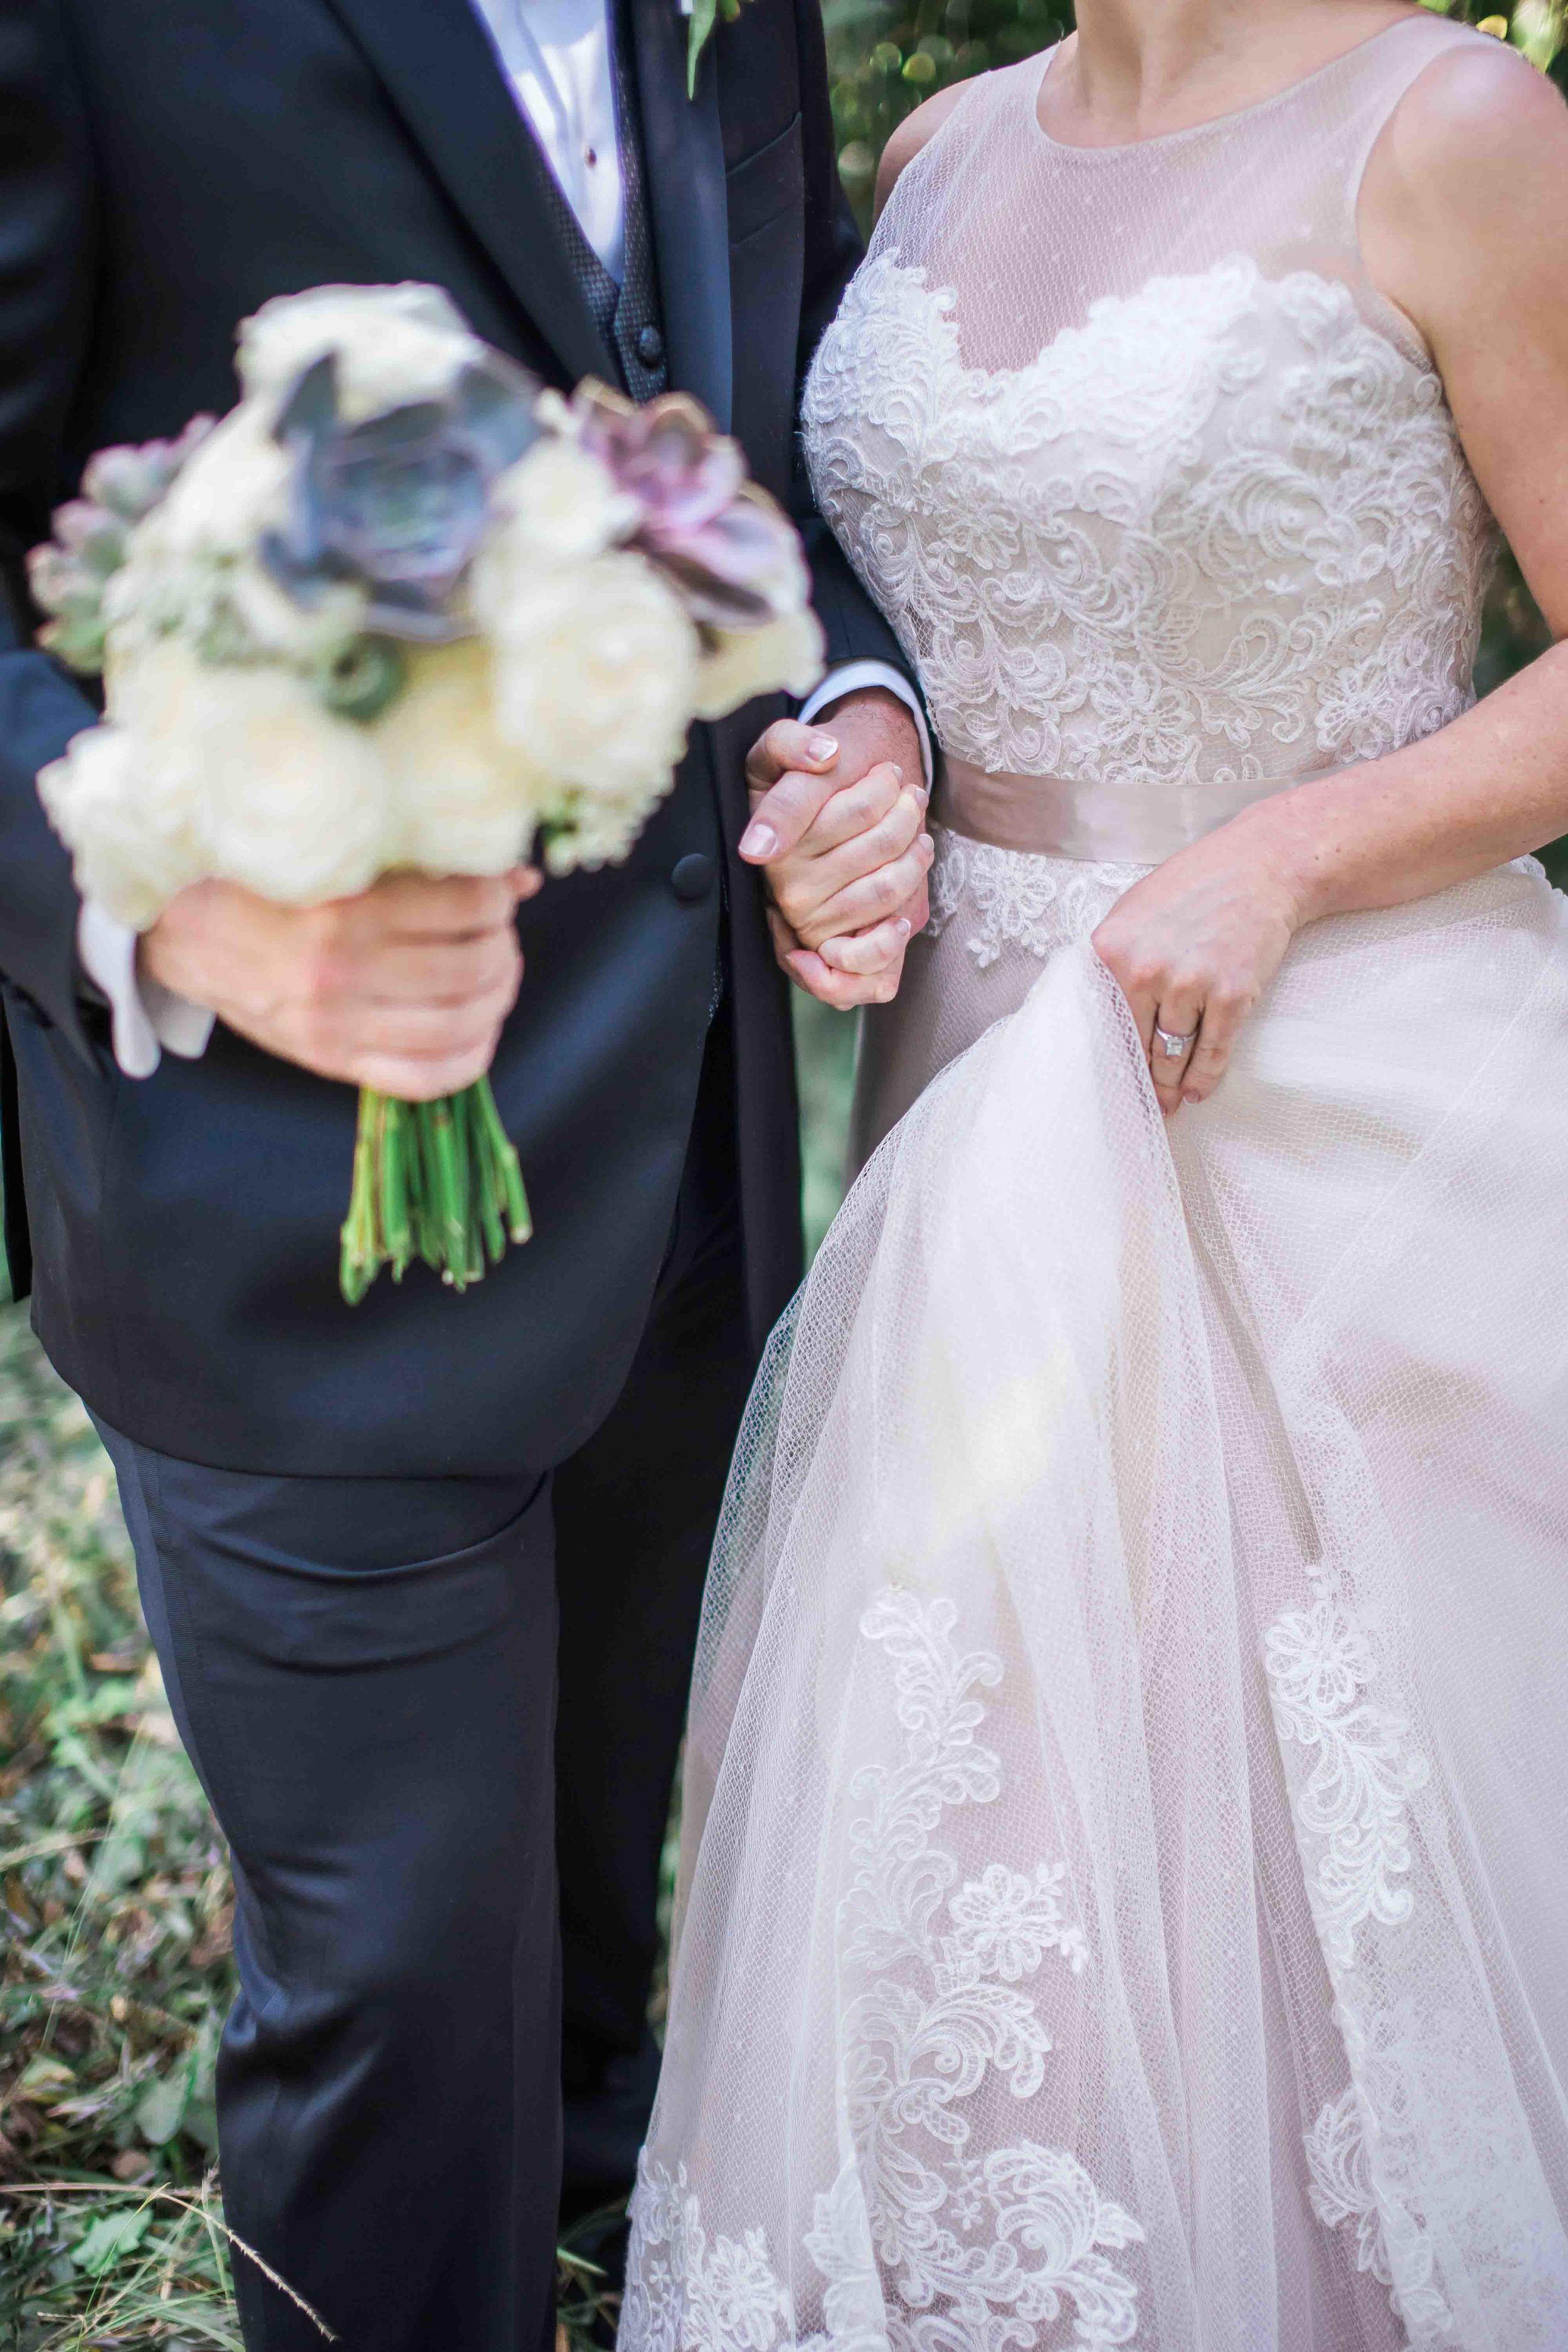 ChrisandAnja_WEDDING_Brienne_Michelle_Photography_222.JPG